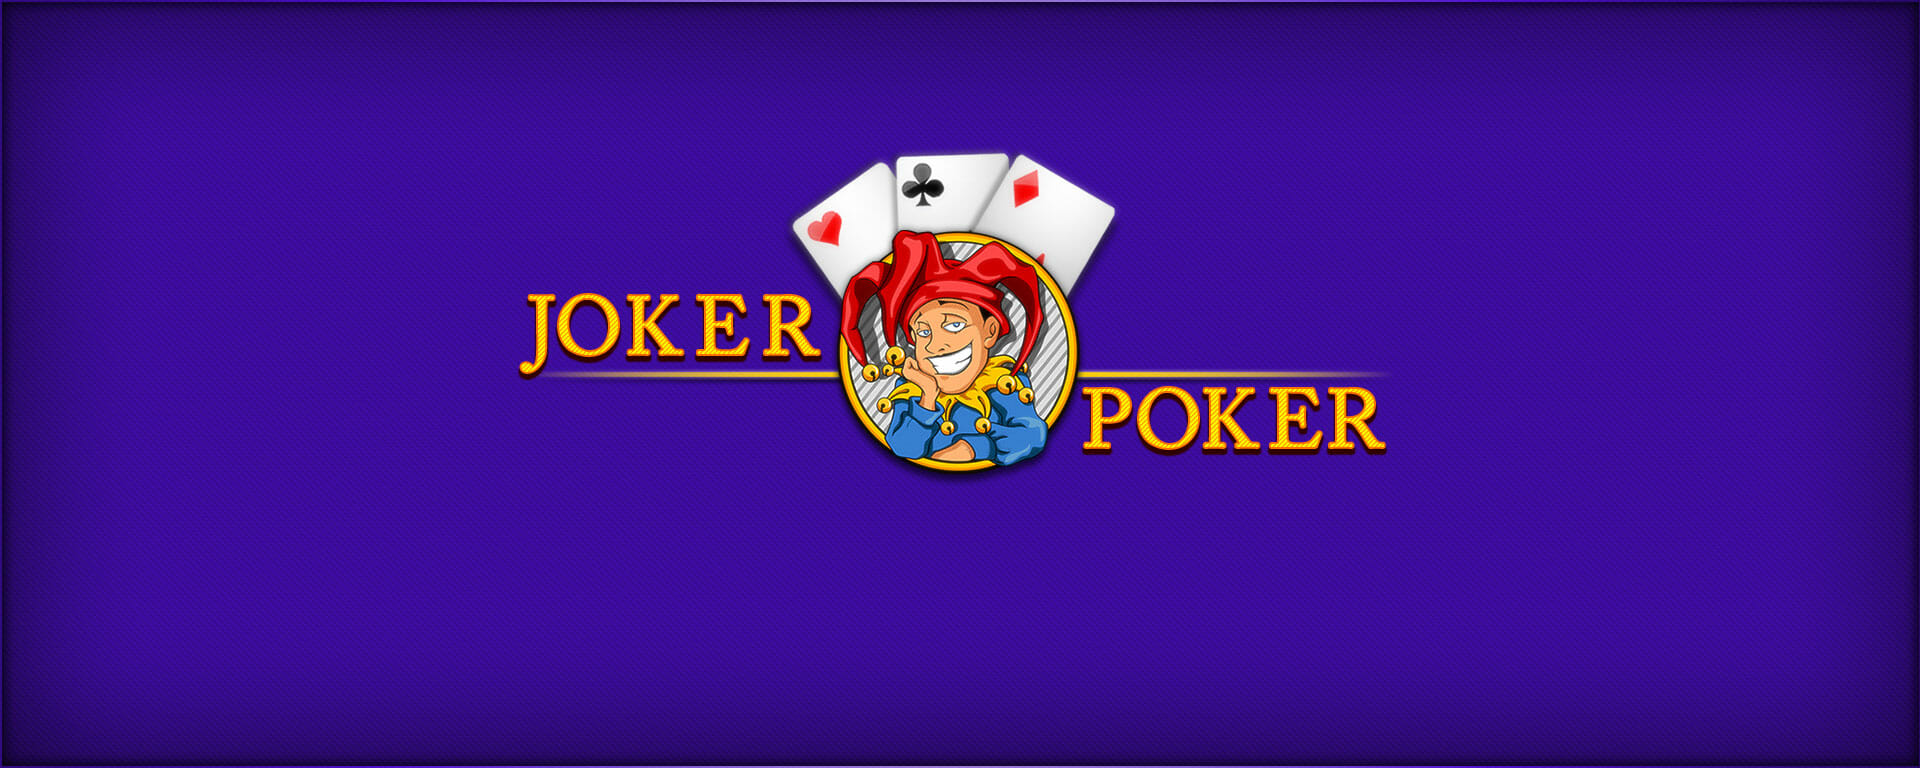 VideoPoker Joker Poker